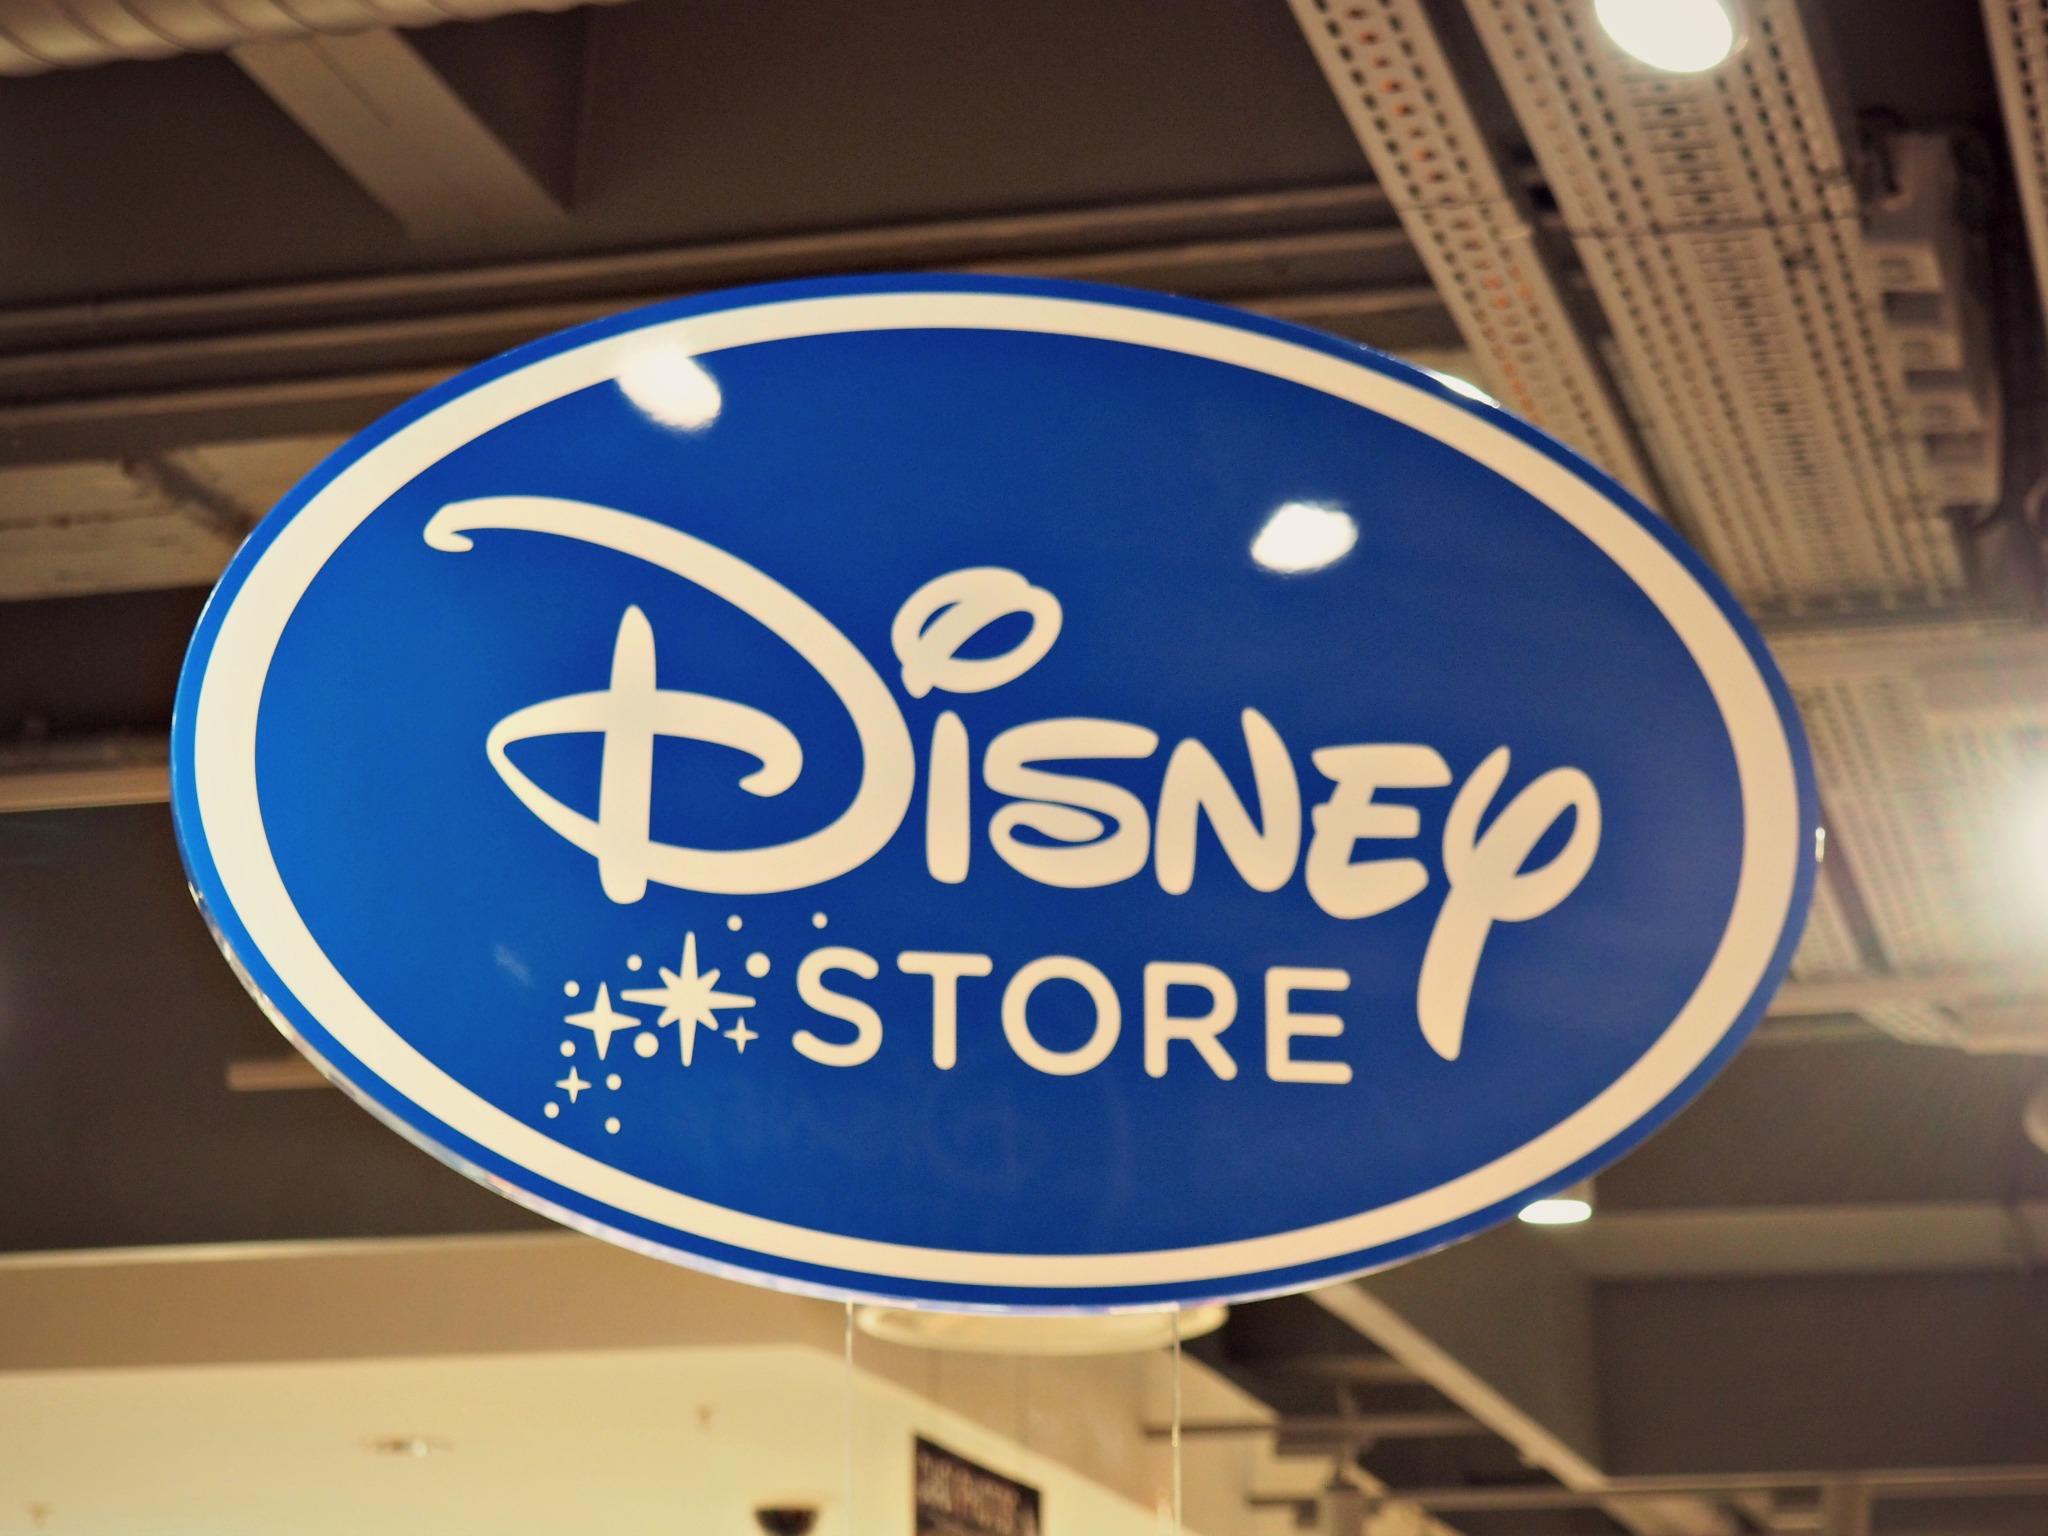 Disney popupstore CentreBourse blog lifestyle marseille